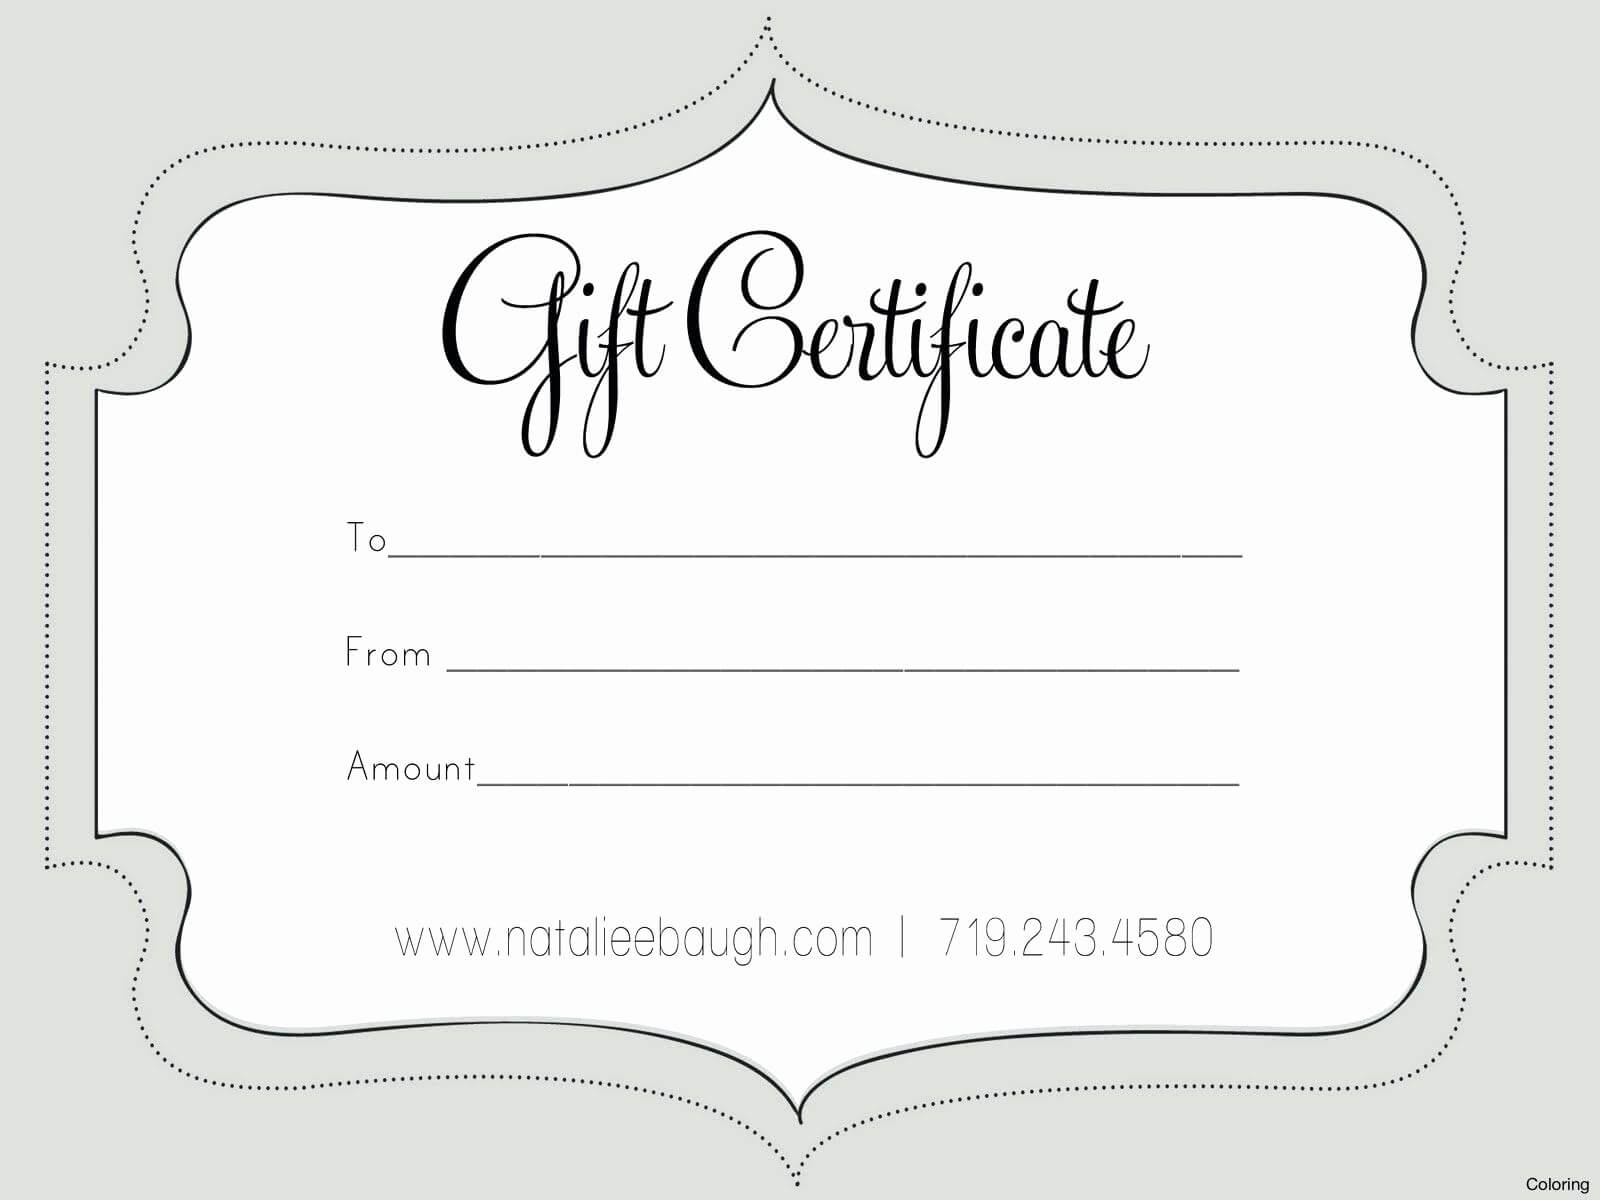 50 Free Gift Card Templates   Culturatti Regarding Nail Gift Certificate Template Free